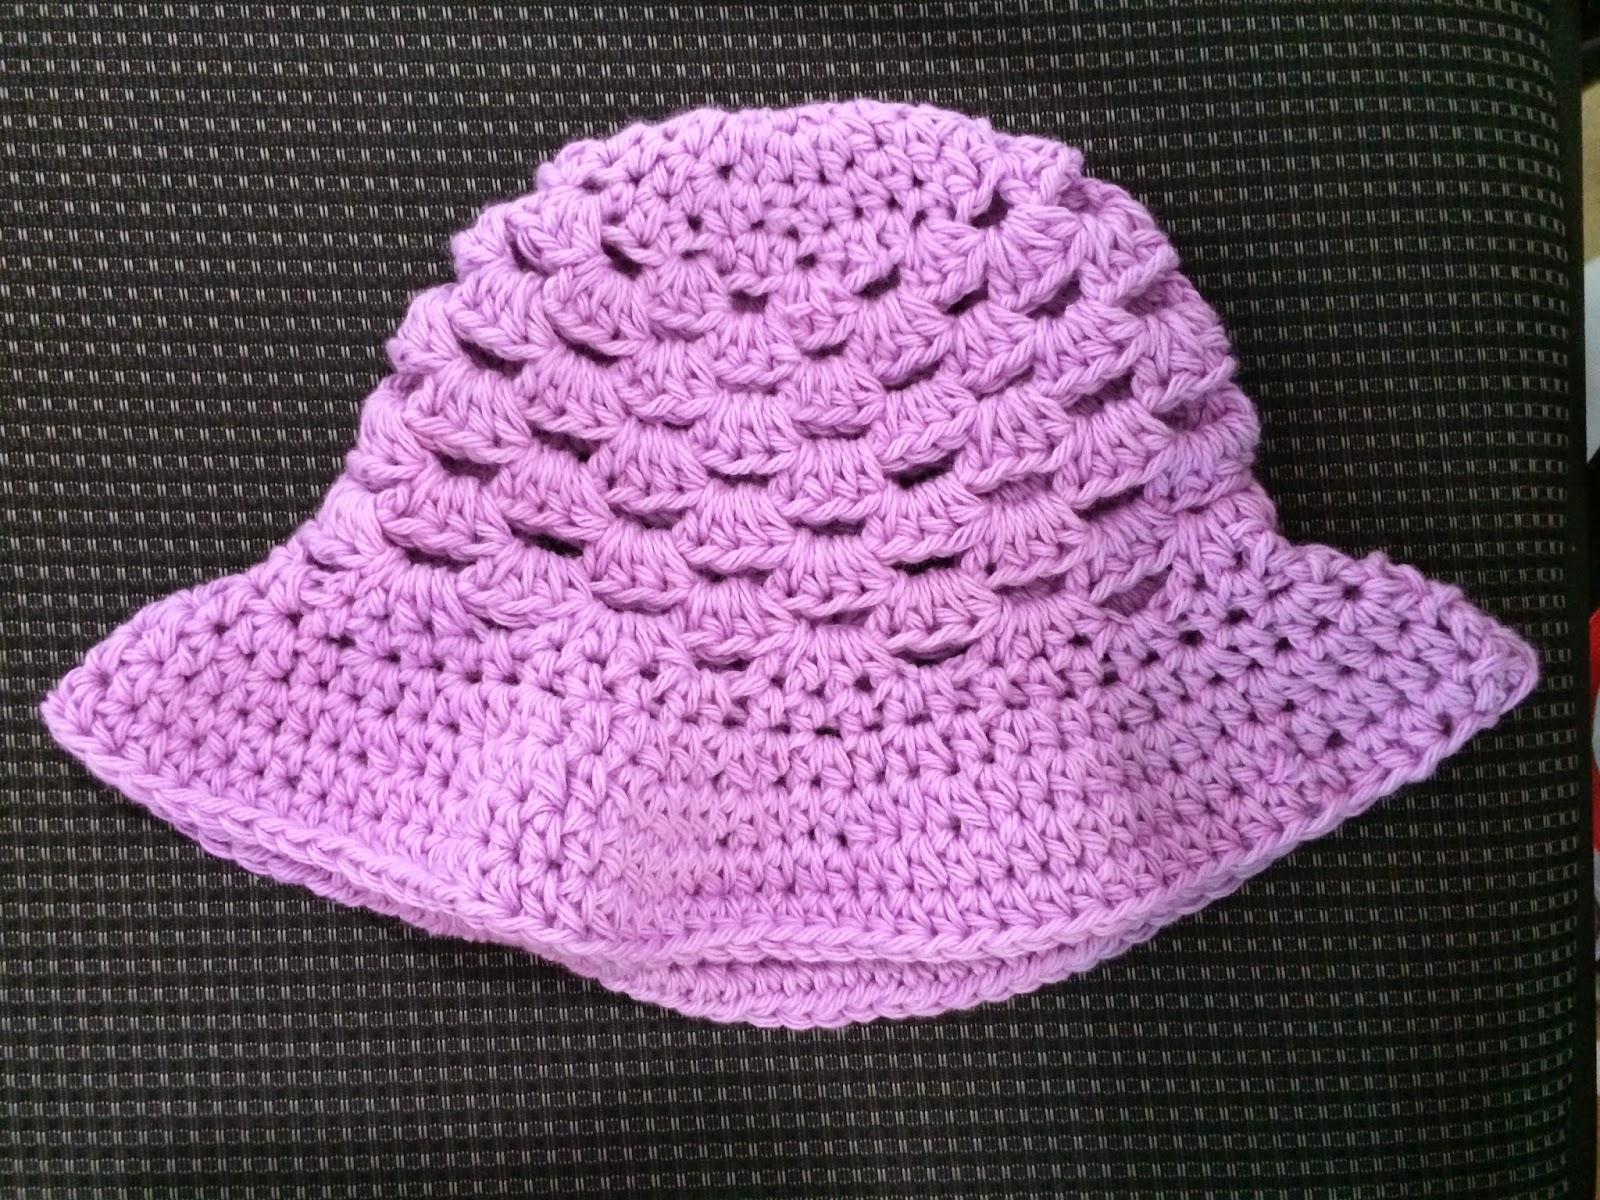 Not My Nanas Crochet!: Cluster Stitch Crochet Cotton Baby ...